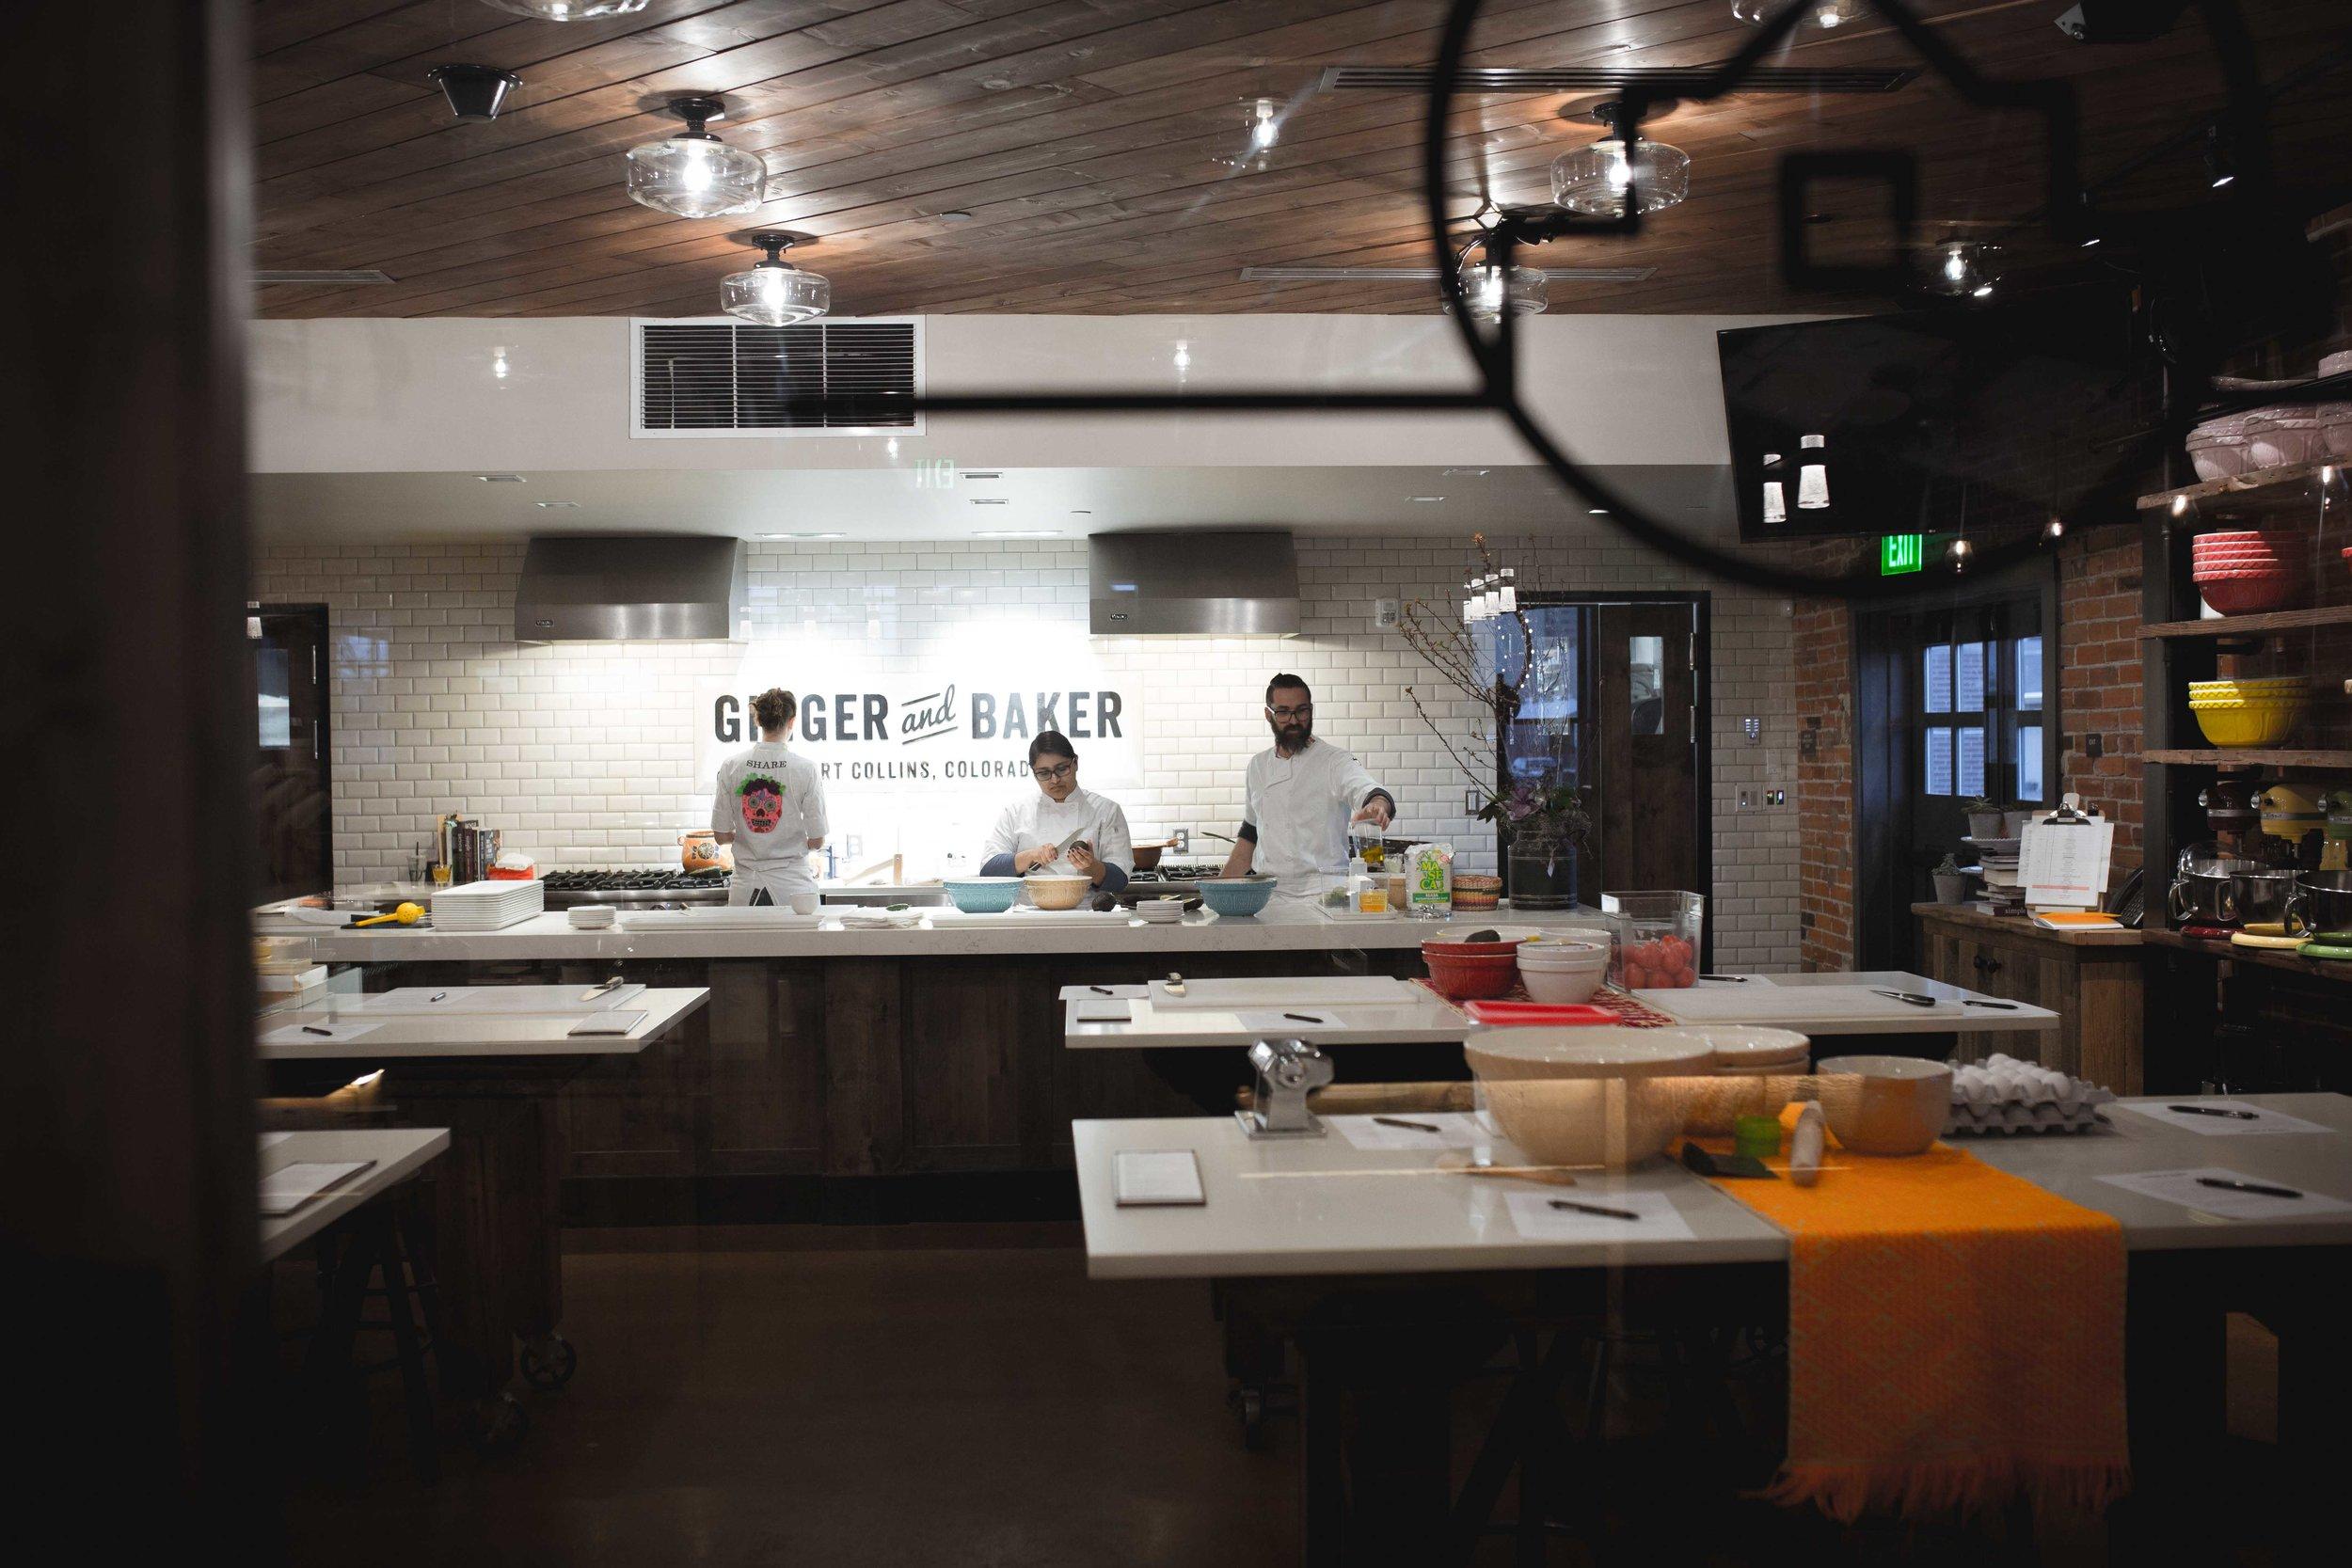 GingerandBaker-JuliyJuan-CookingClass-Feb28-5.jpg